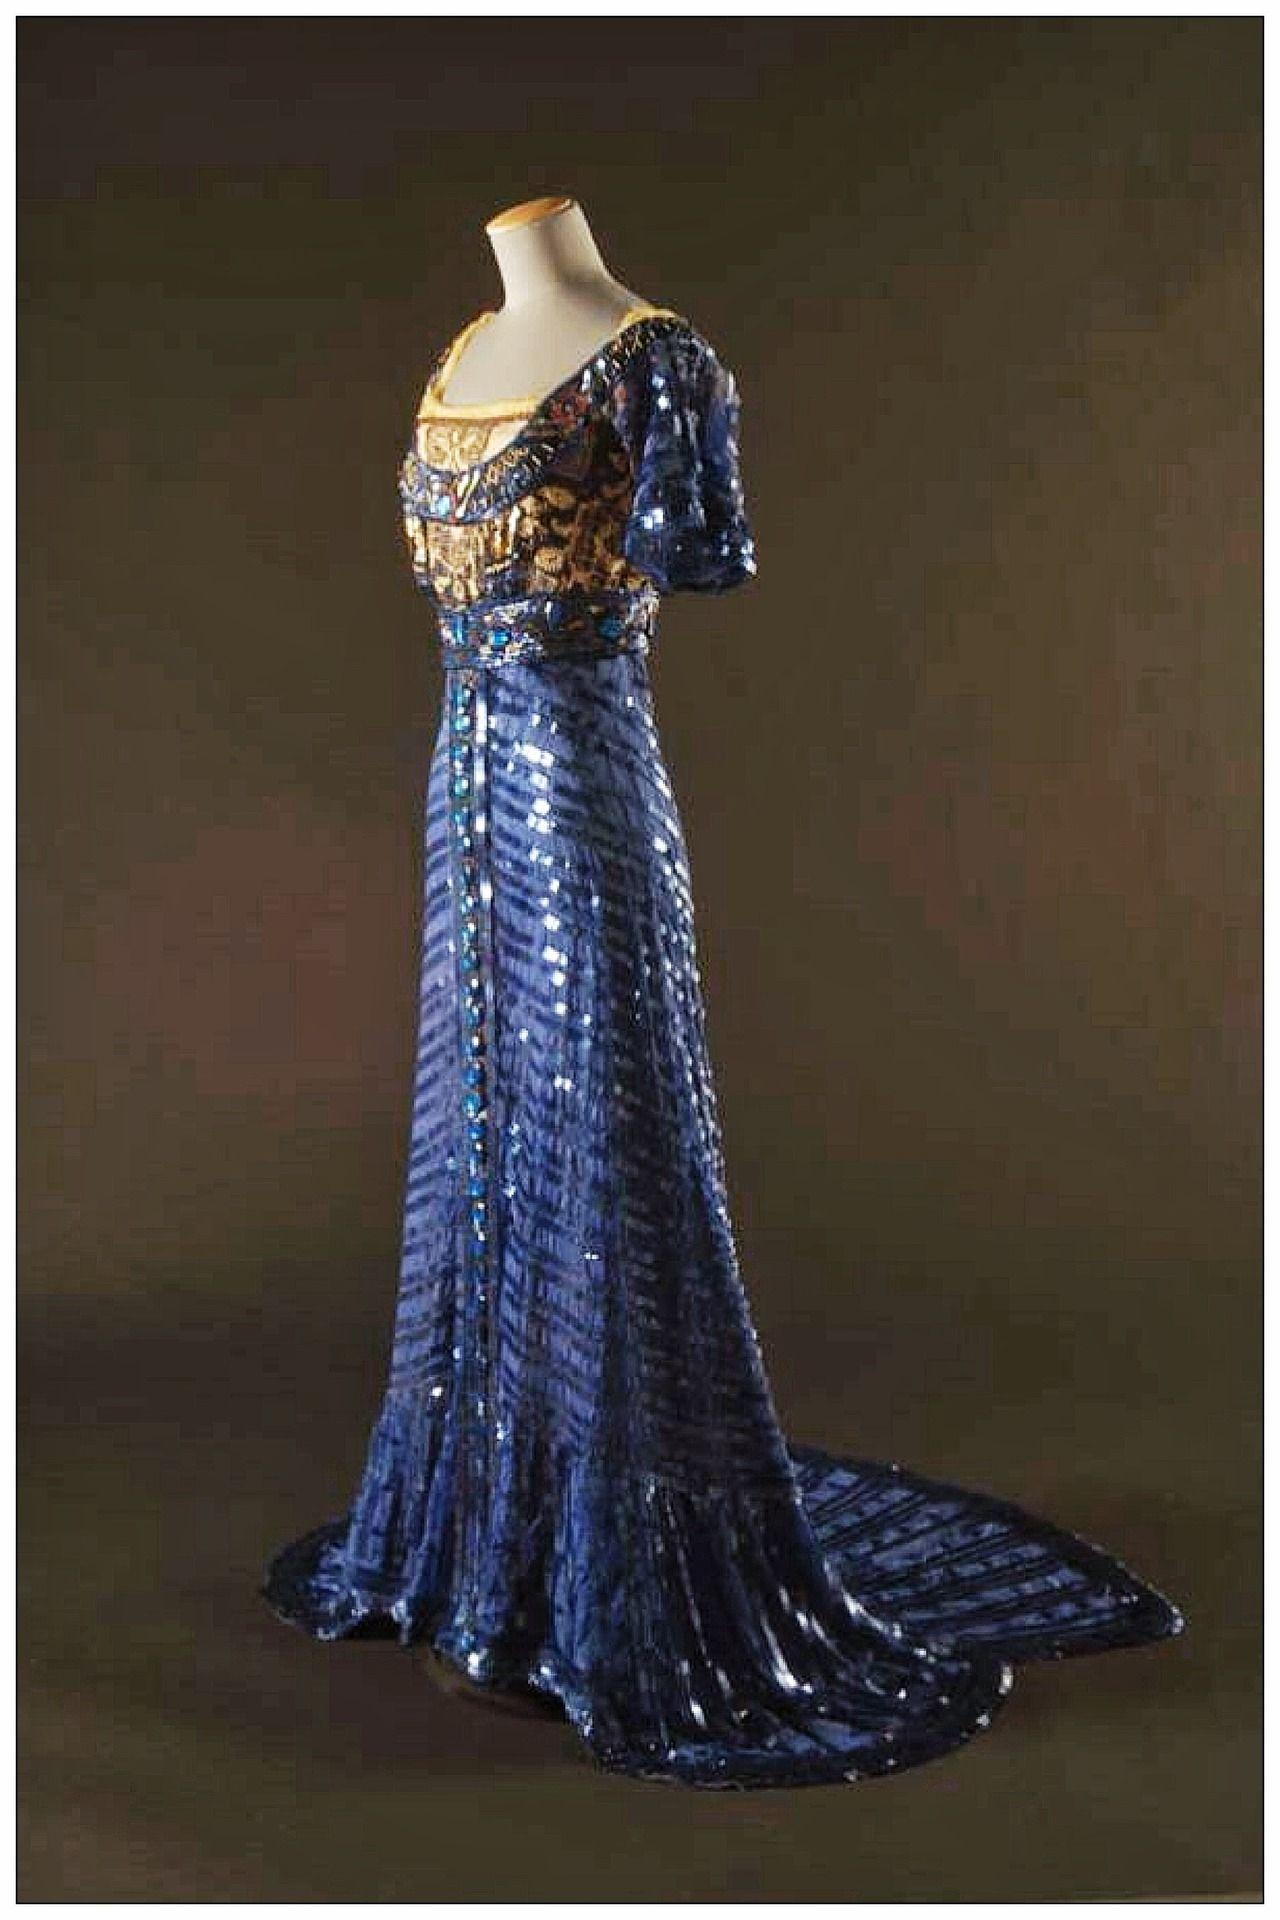 edwardian evening gown | Edwardian | Pinterest | Gowns, Royal blue ...